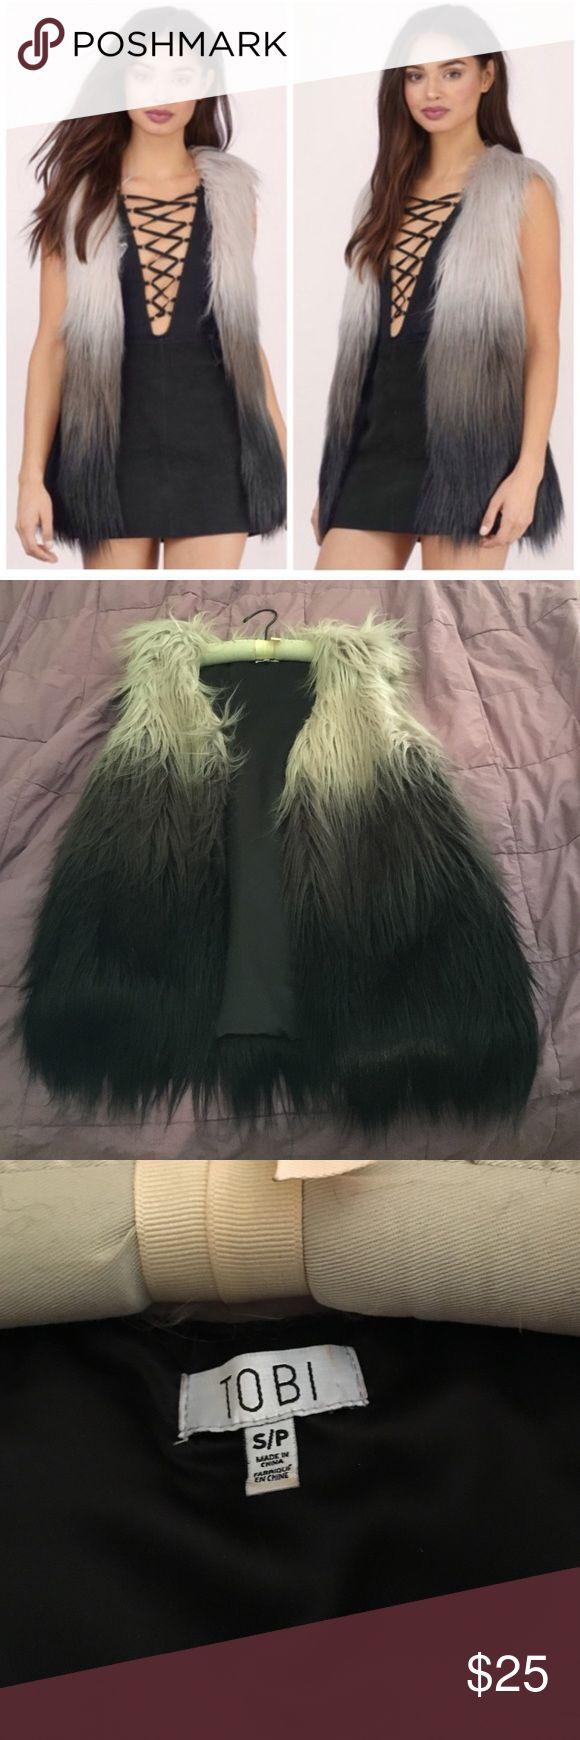 Faux fur ombré vest! Faux fur black and grey ombré fur vest! Worn only once, no wear and tear 💙💙💙 price is firm Tobi Jackets & Coats Vests